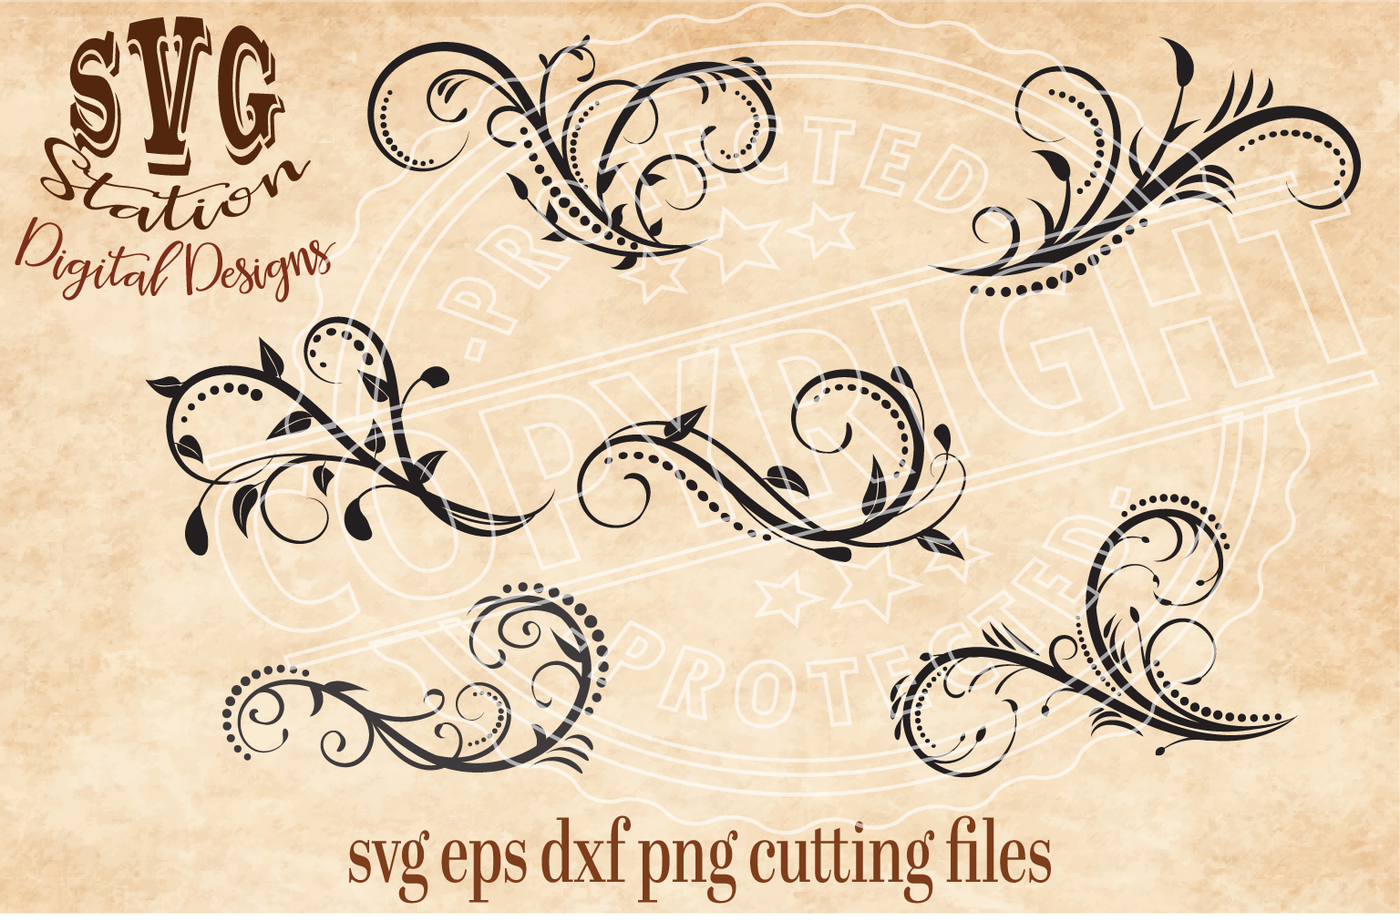 Six Ornamental Flourish Swirls Svg Dxf Png Eps Cutting File Silhouette Cricut By Svg Station Thehungryjpeg Com